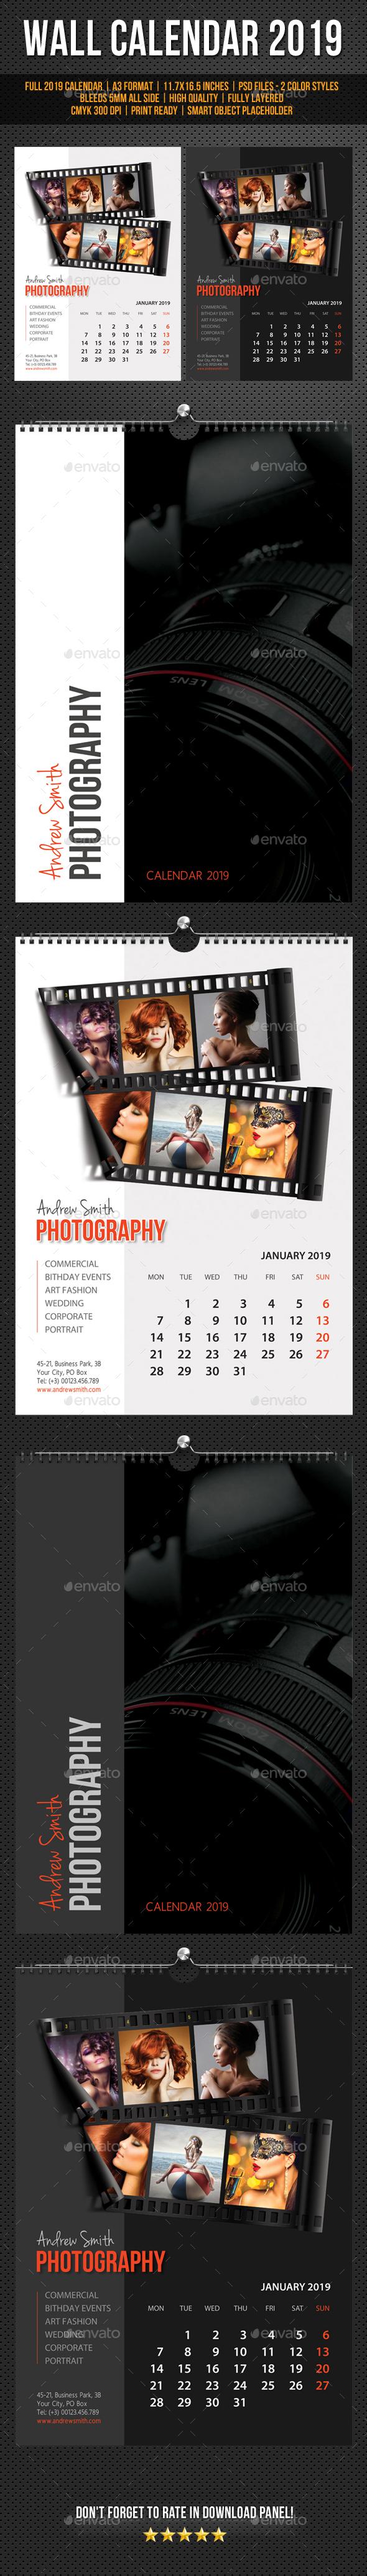 Wall Calendar A3 2019 v18 - Calendars Stationery